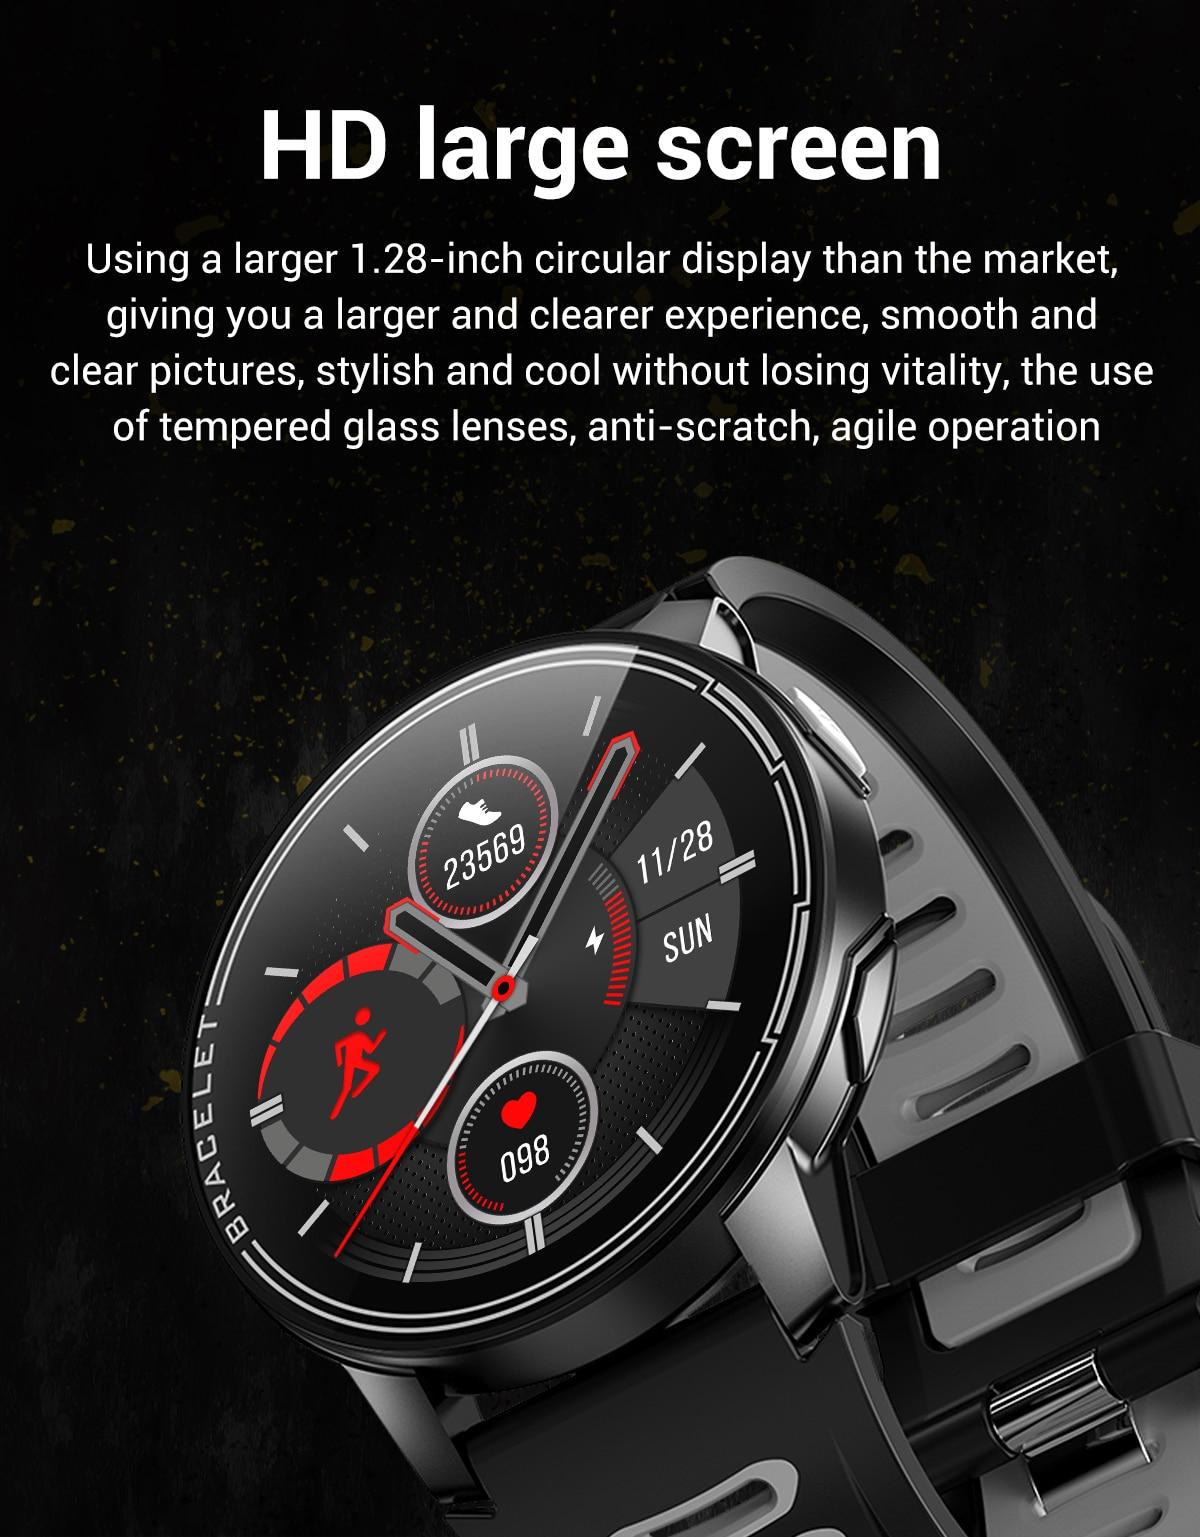 lowest price SENBONO S20 full screen waterproof smart watch Bluetooth 5 0 fitness tracker heart rate monitoring smart clock for men and women